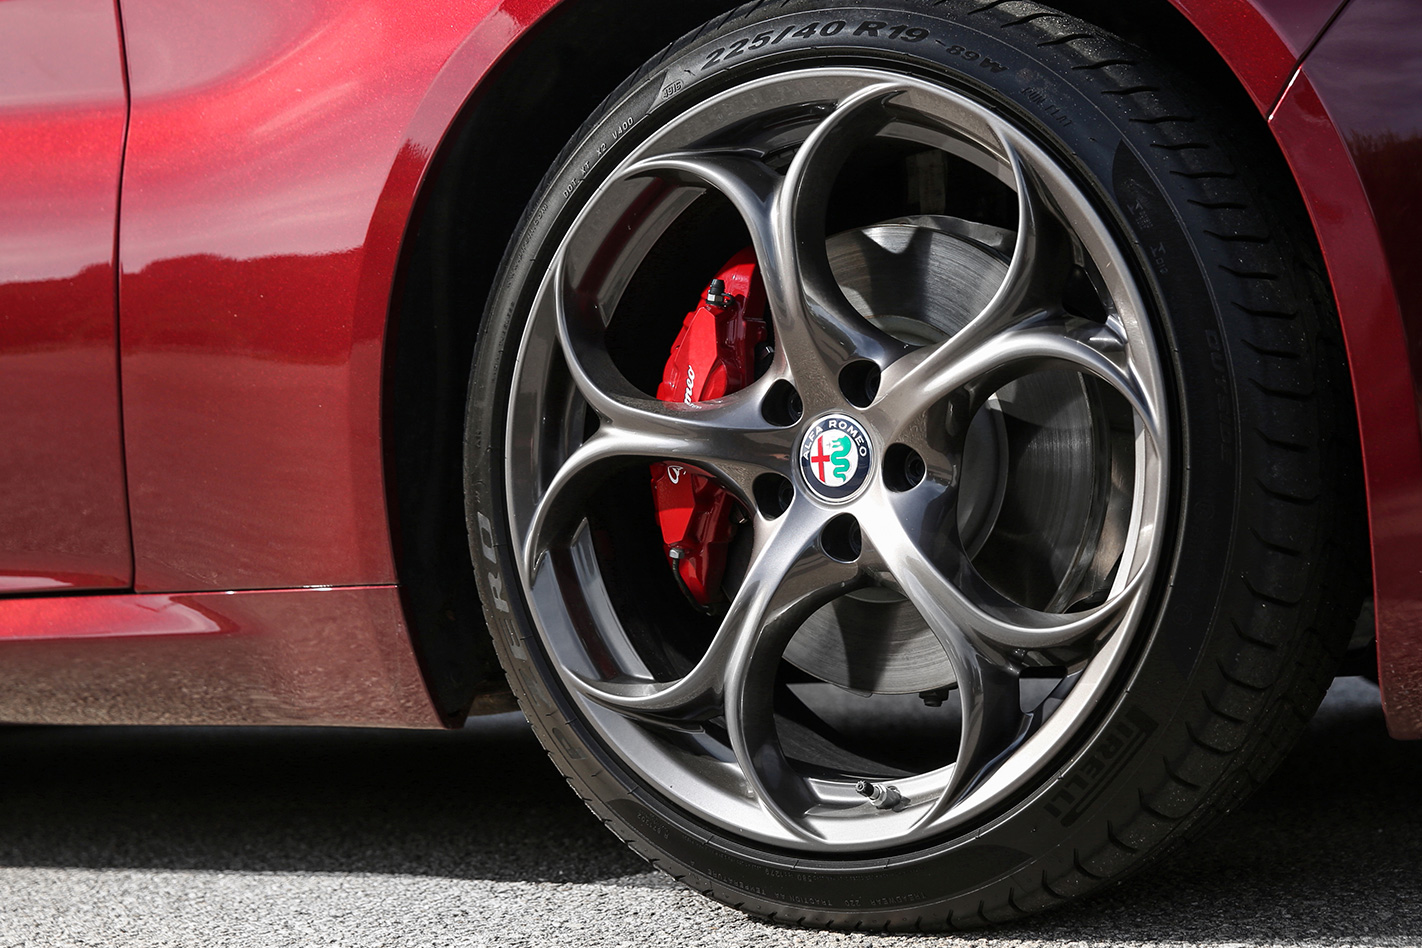 2017 Alfa Romeo Giulia Veloce wheel